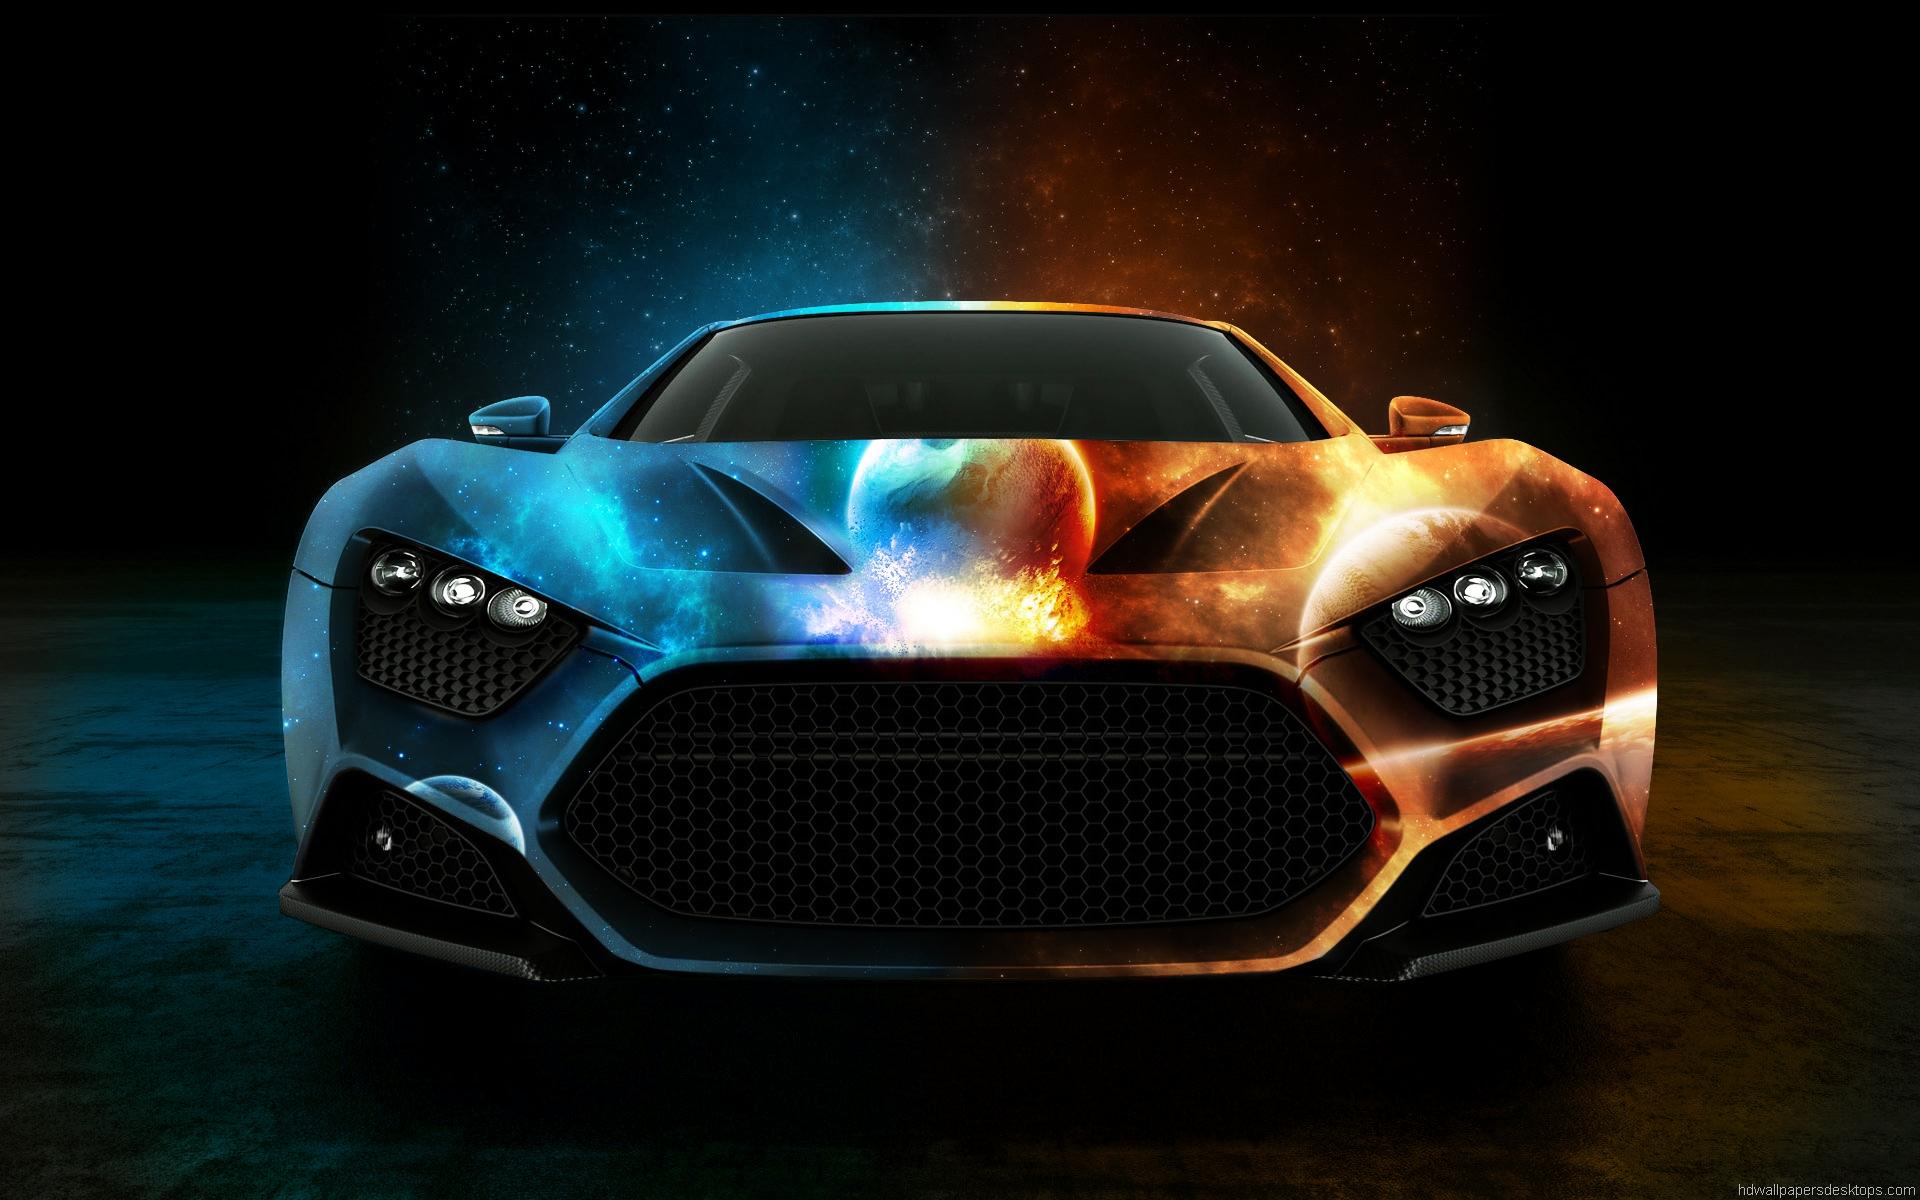 Hd wallpaper cars - Hd Wallpaper Car 70 Wallpapers